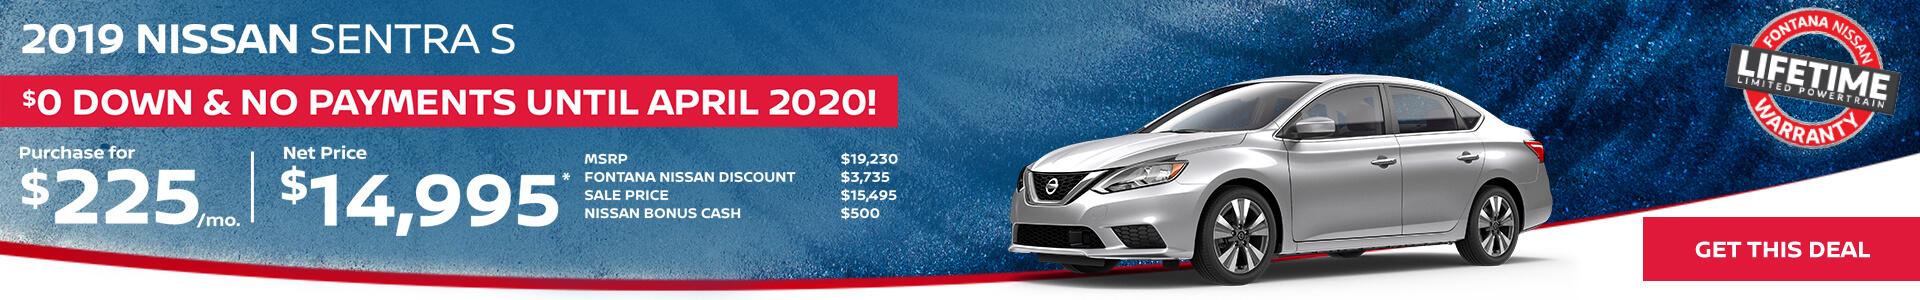 Nissan Sentra $225